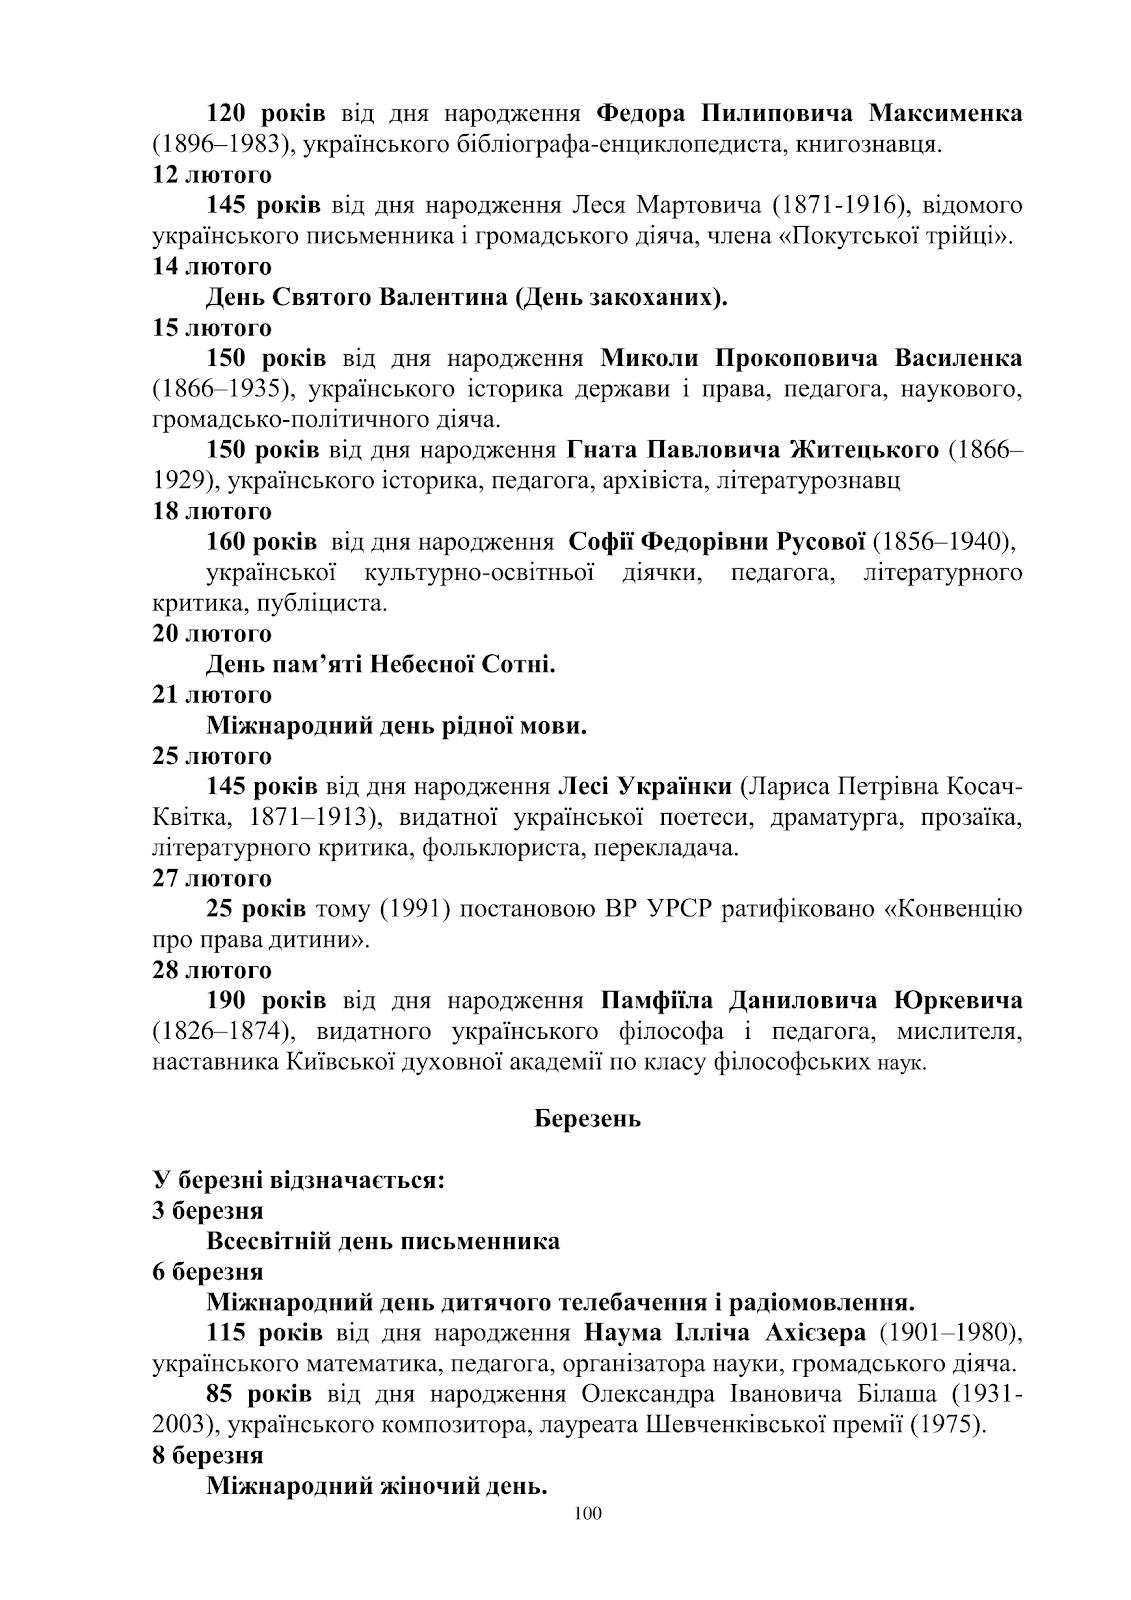 C:\Users\Валерия\Desktop\план 2016 рік\план 2016 рік-100.png